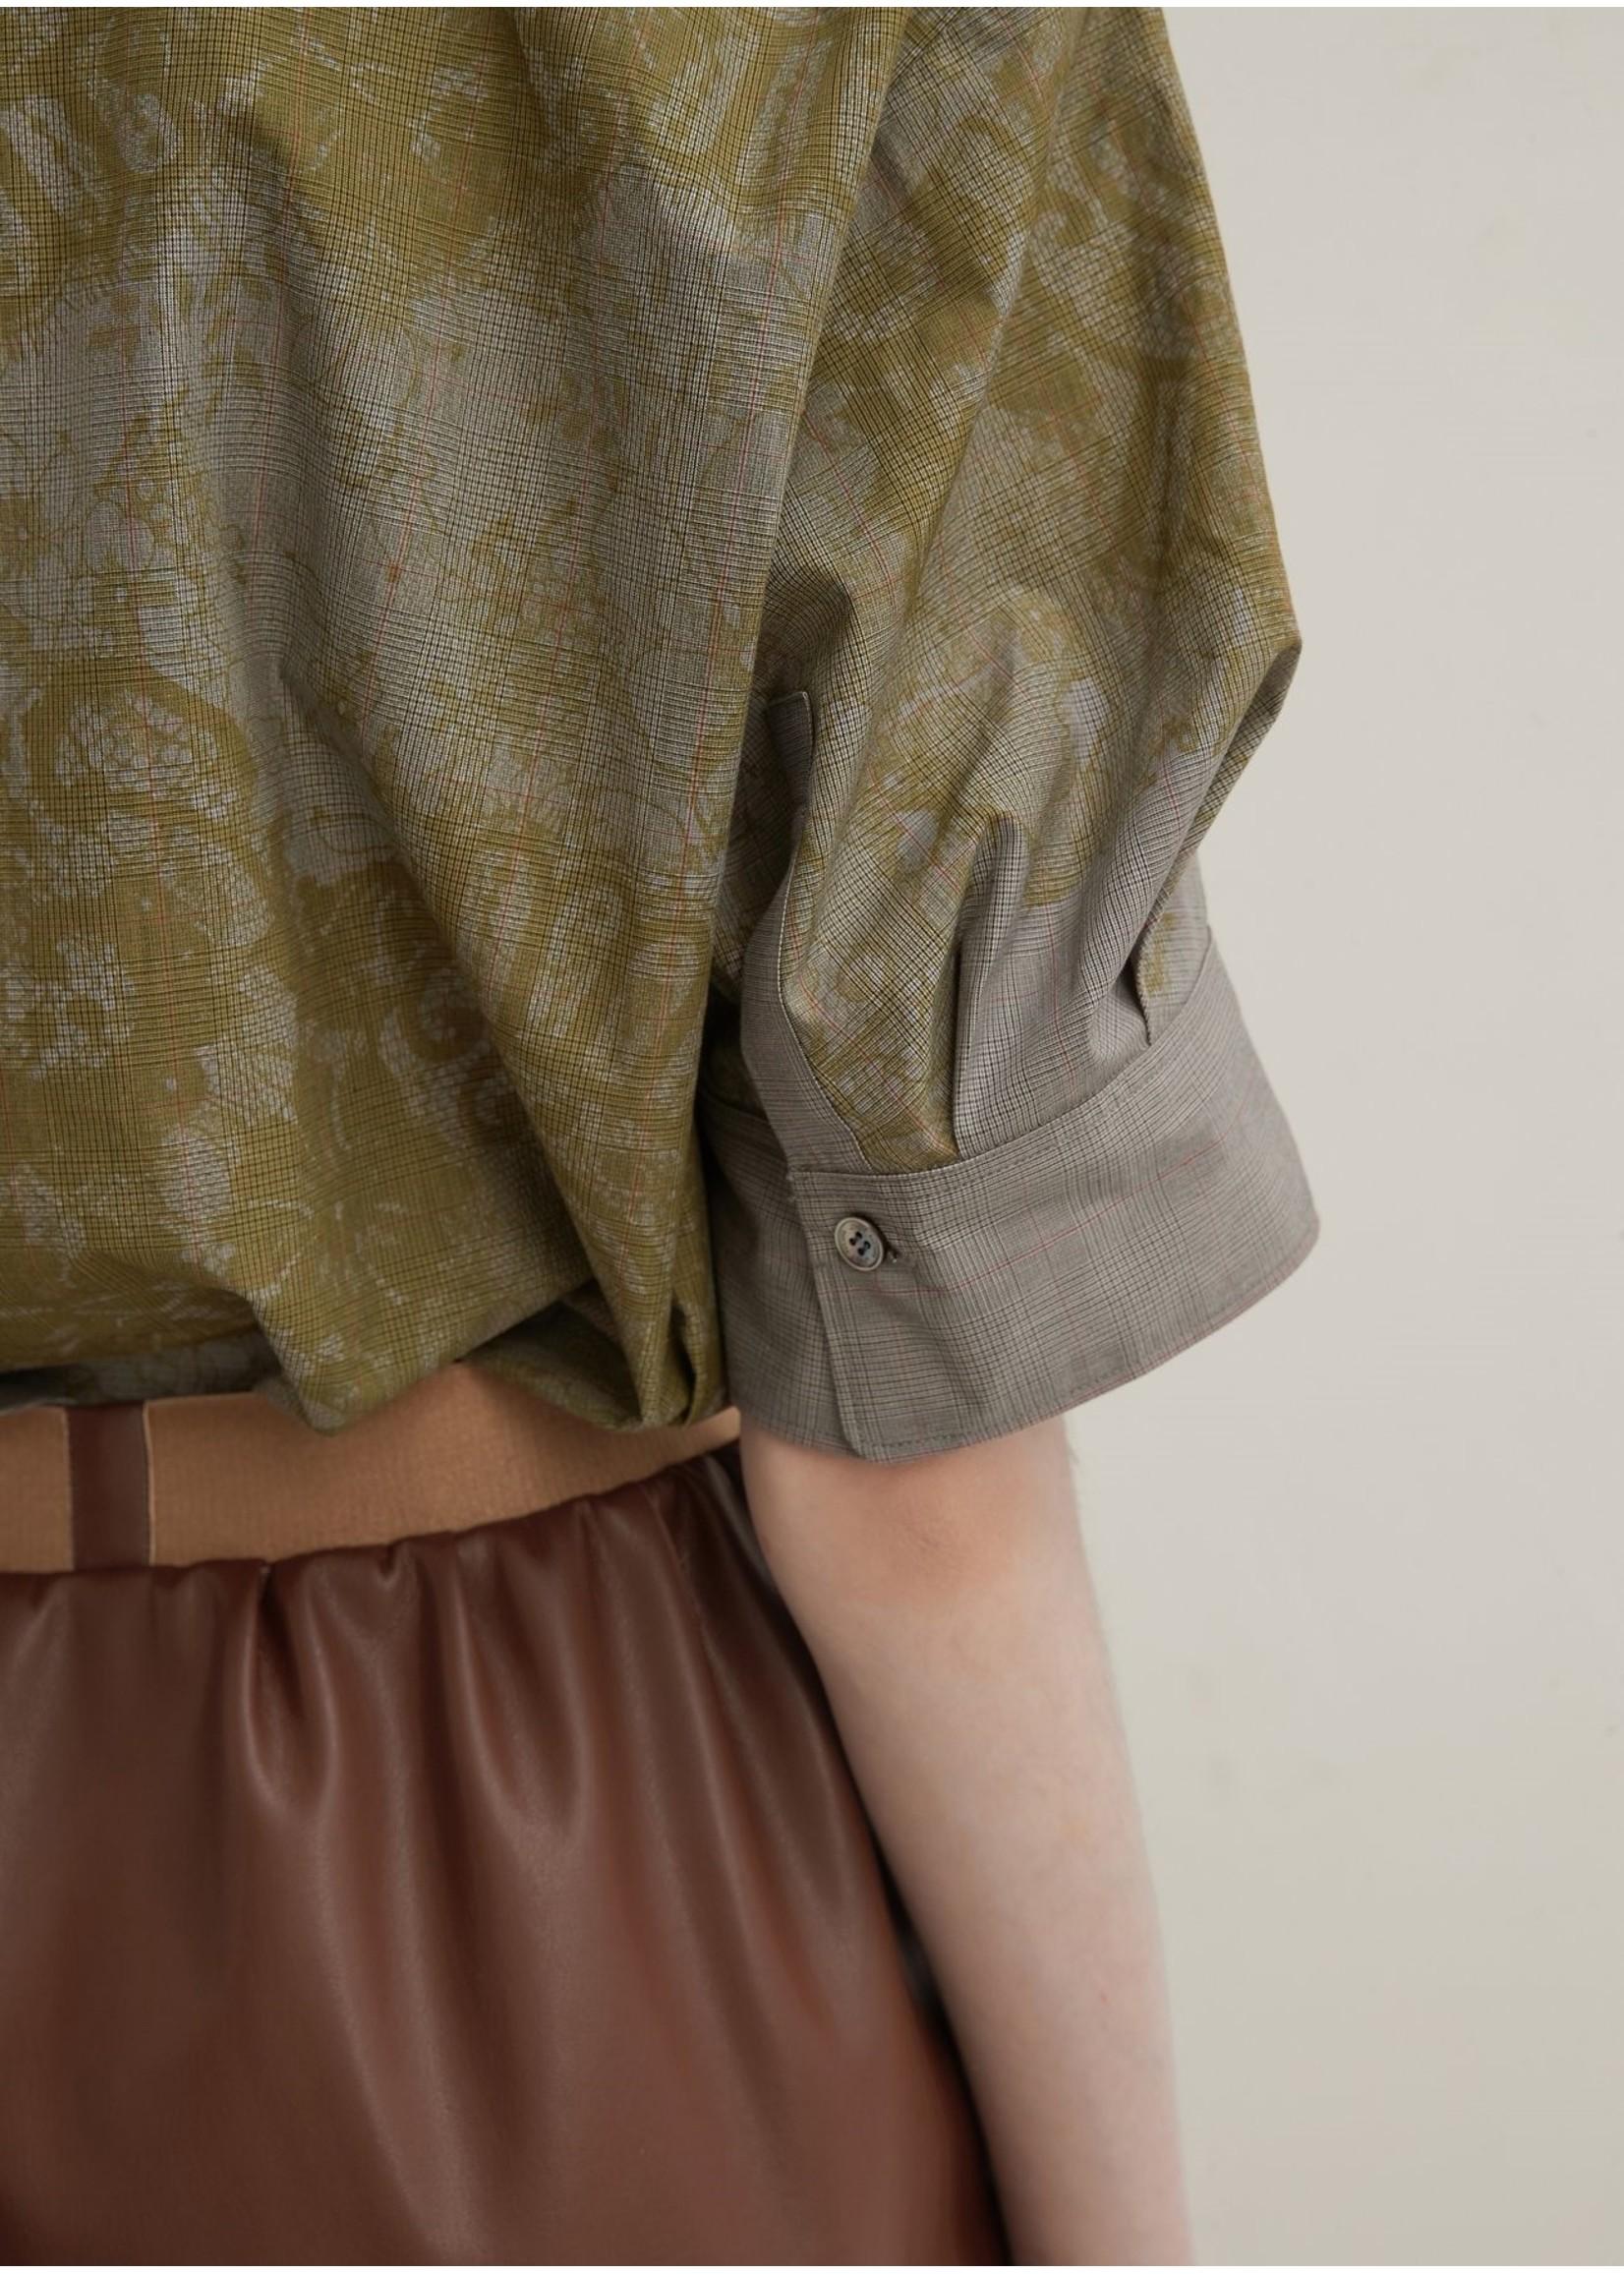 JNBY 5k5160160 blouse lime